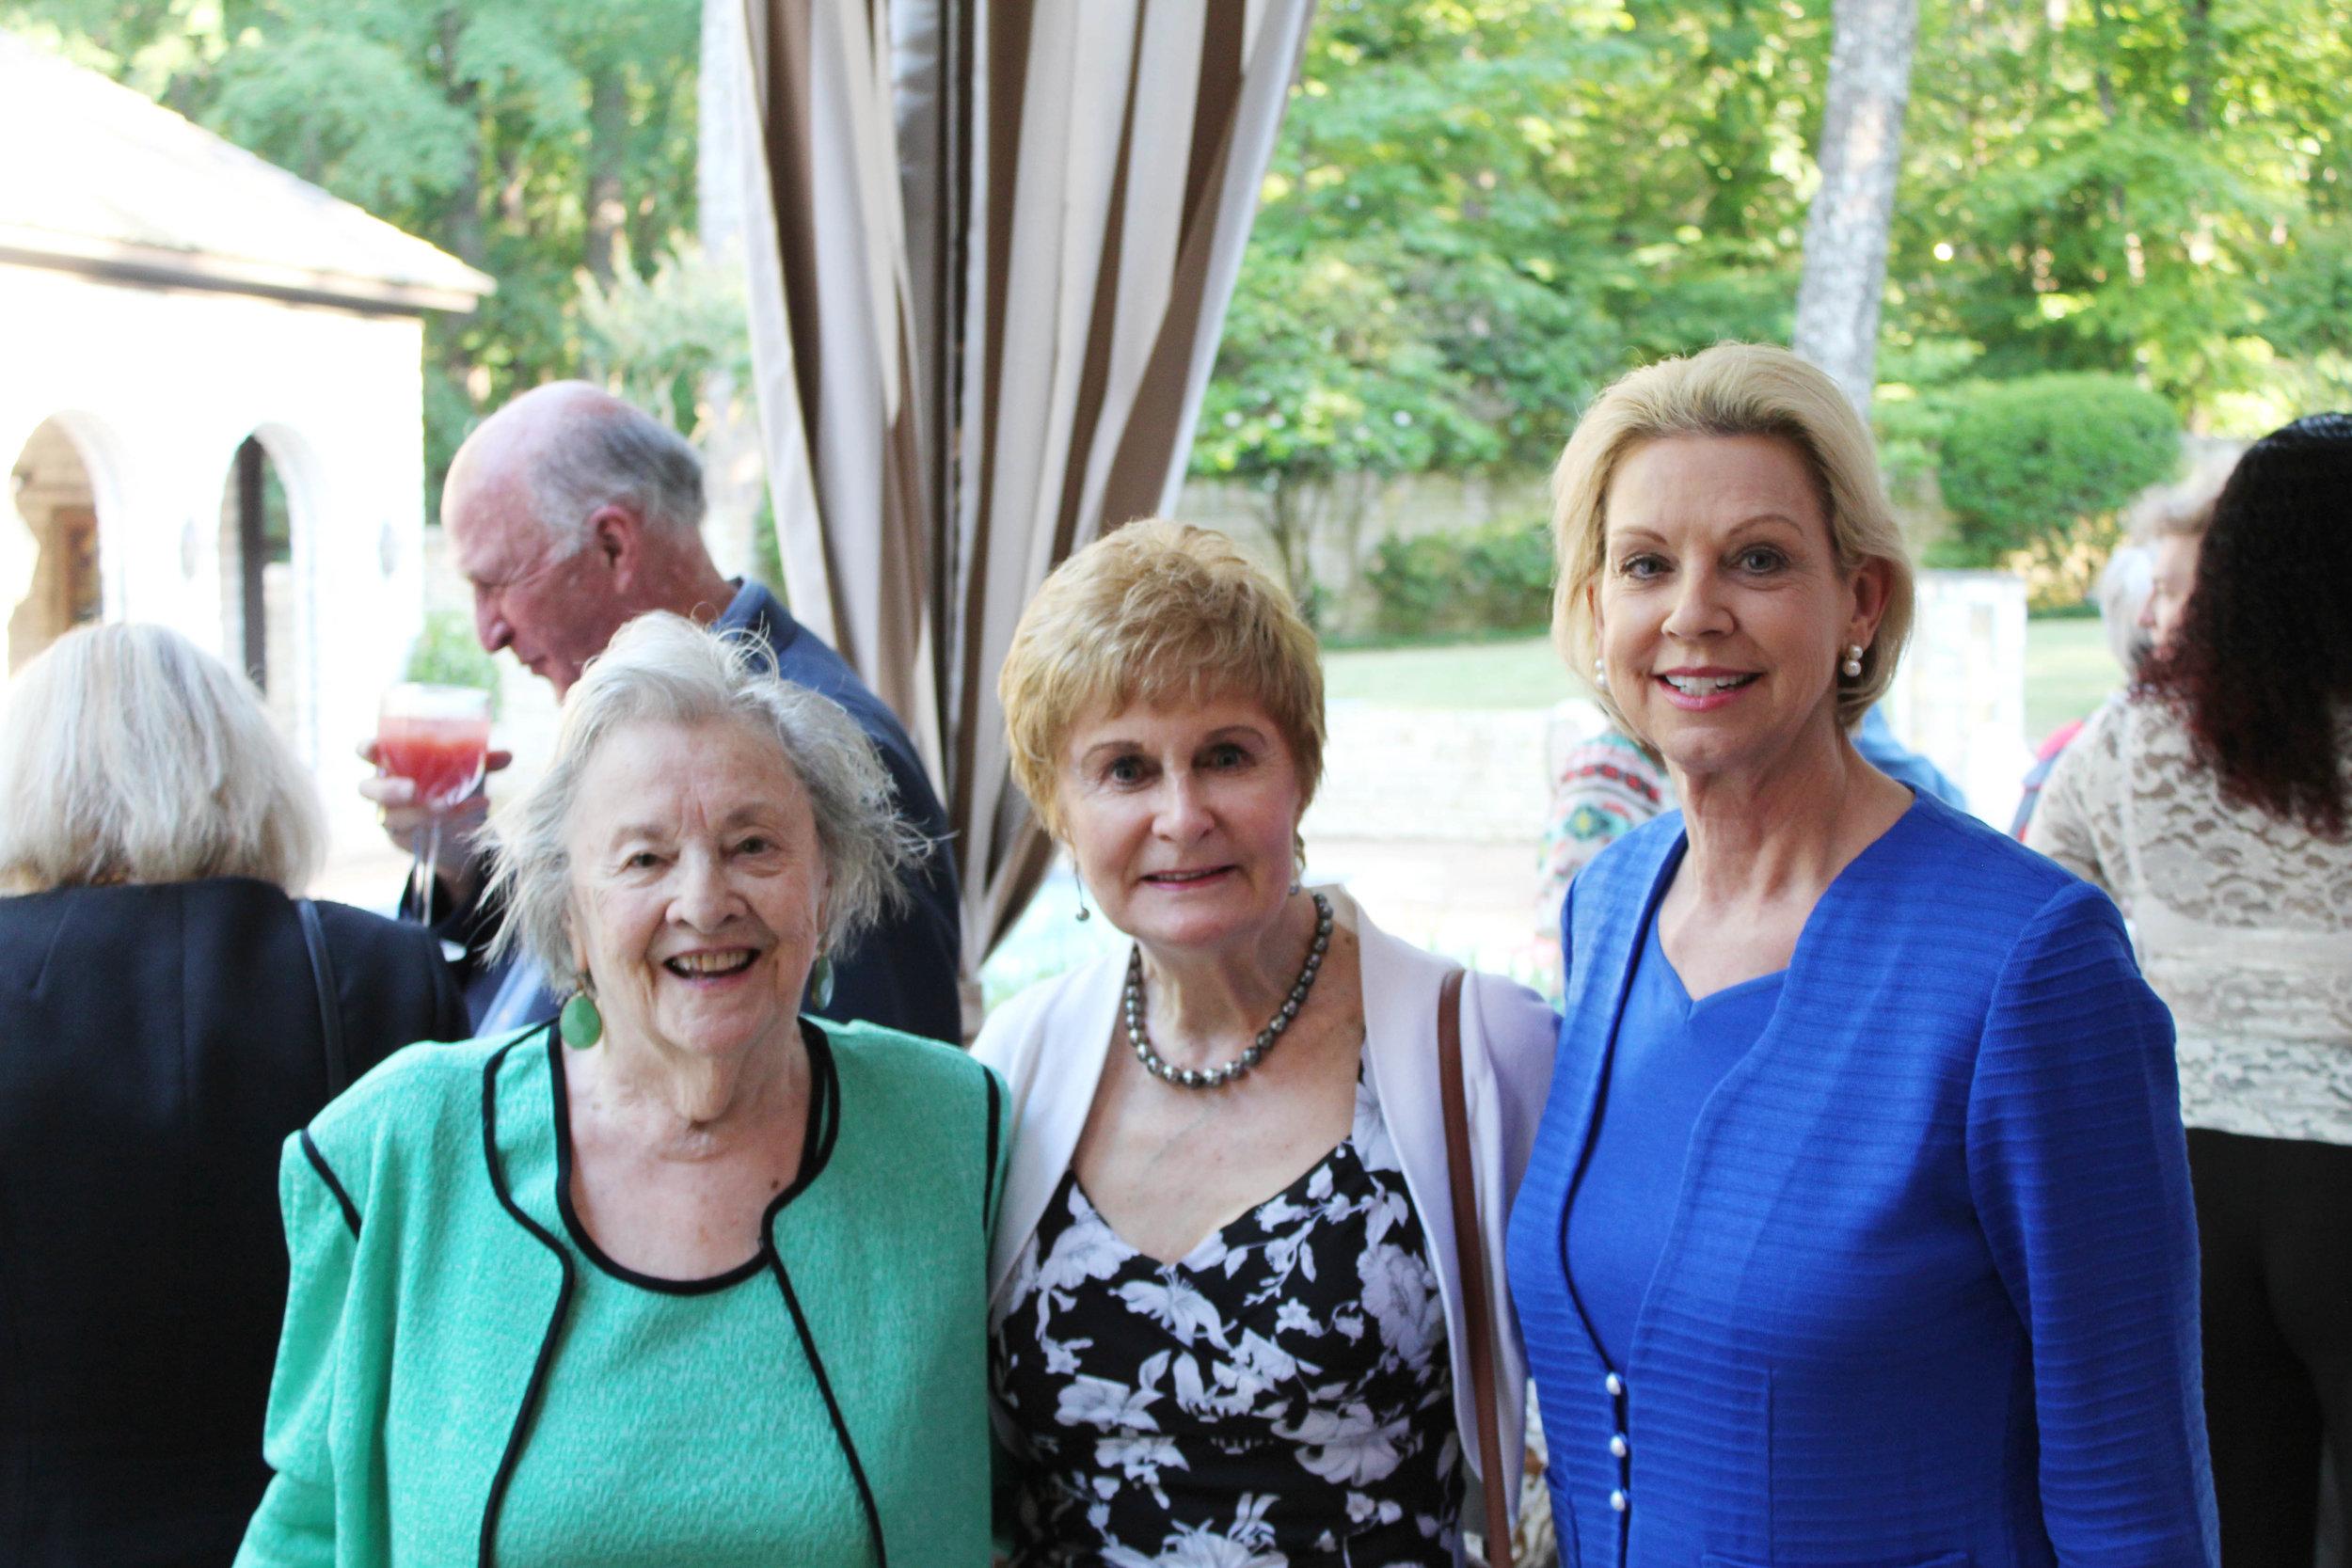 Pam McCoy, Jo Kahler and Nancy Lund